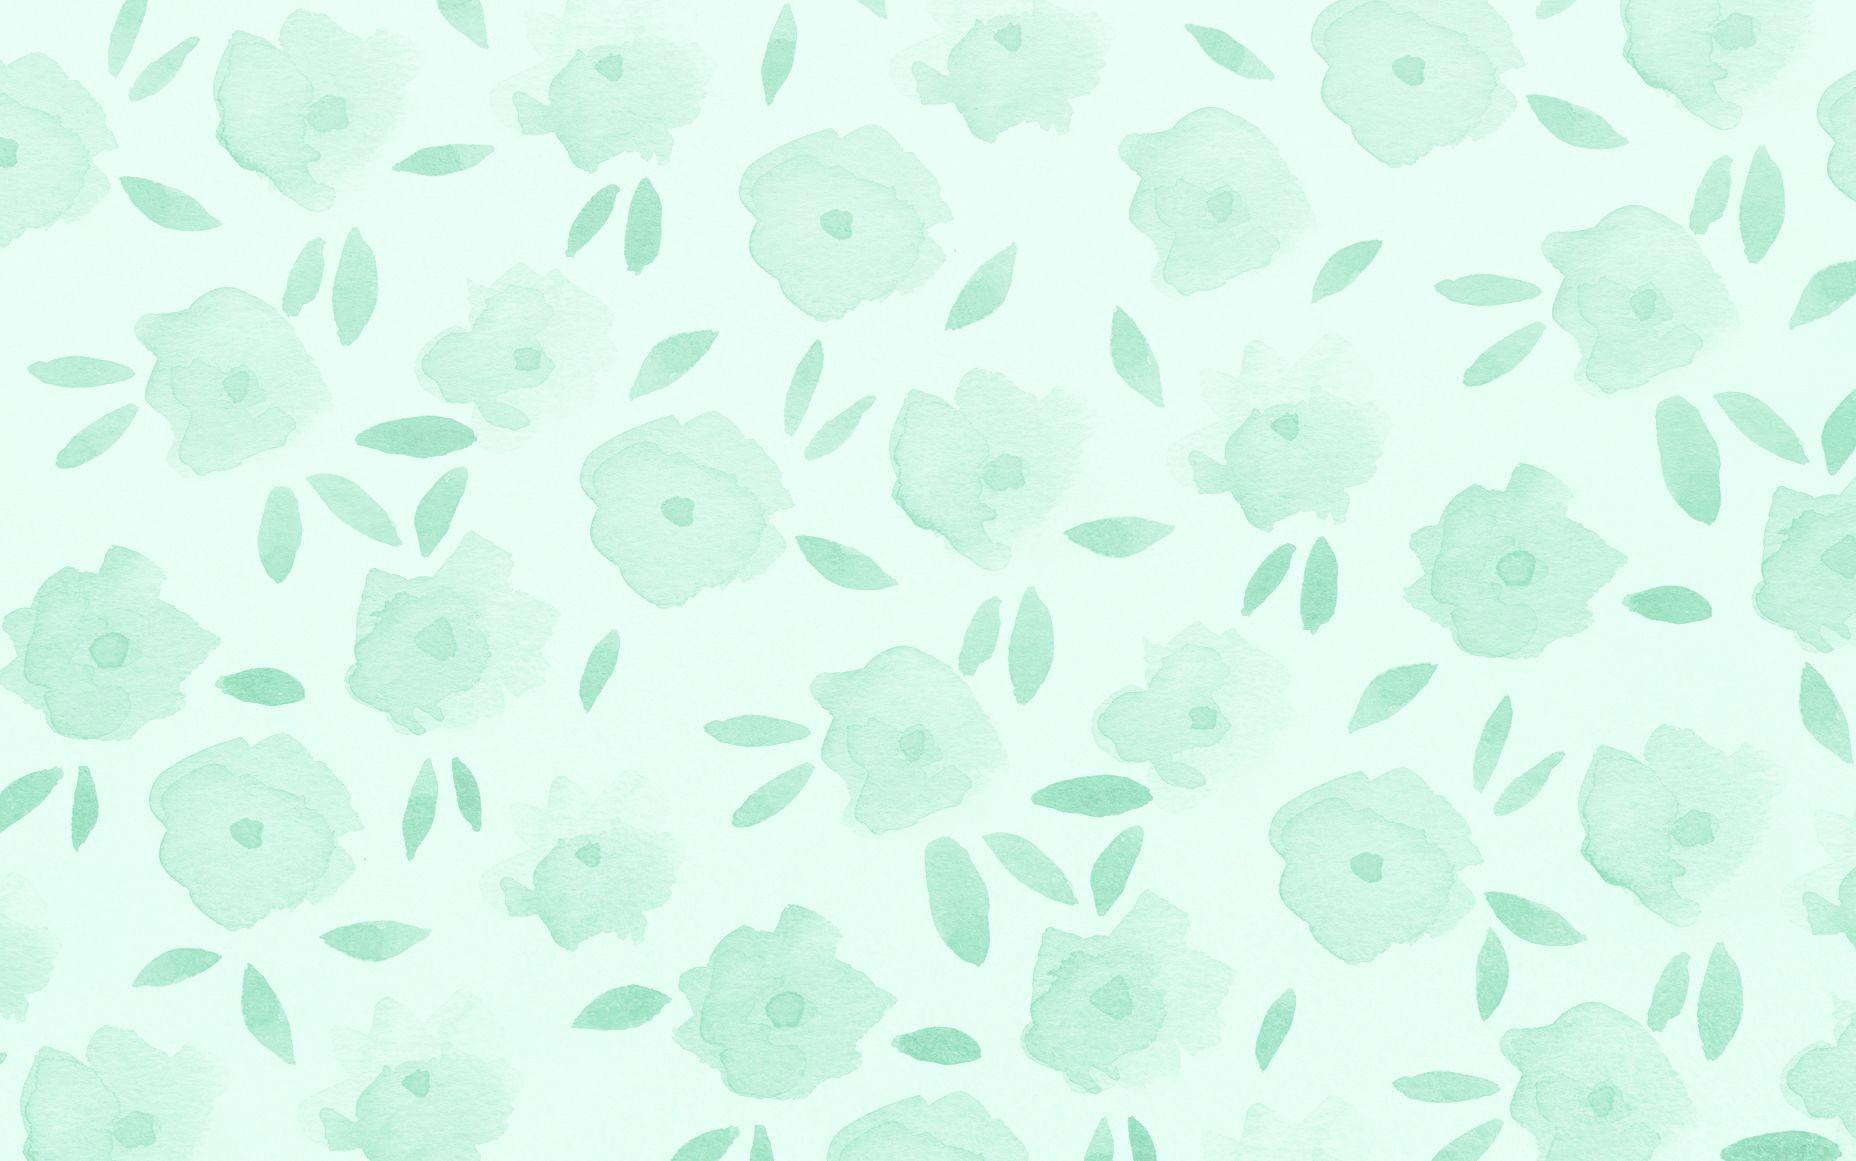 JenBPeters Flowers Mint Mint green wallpaper, August